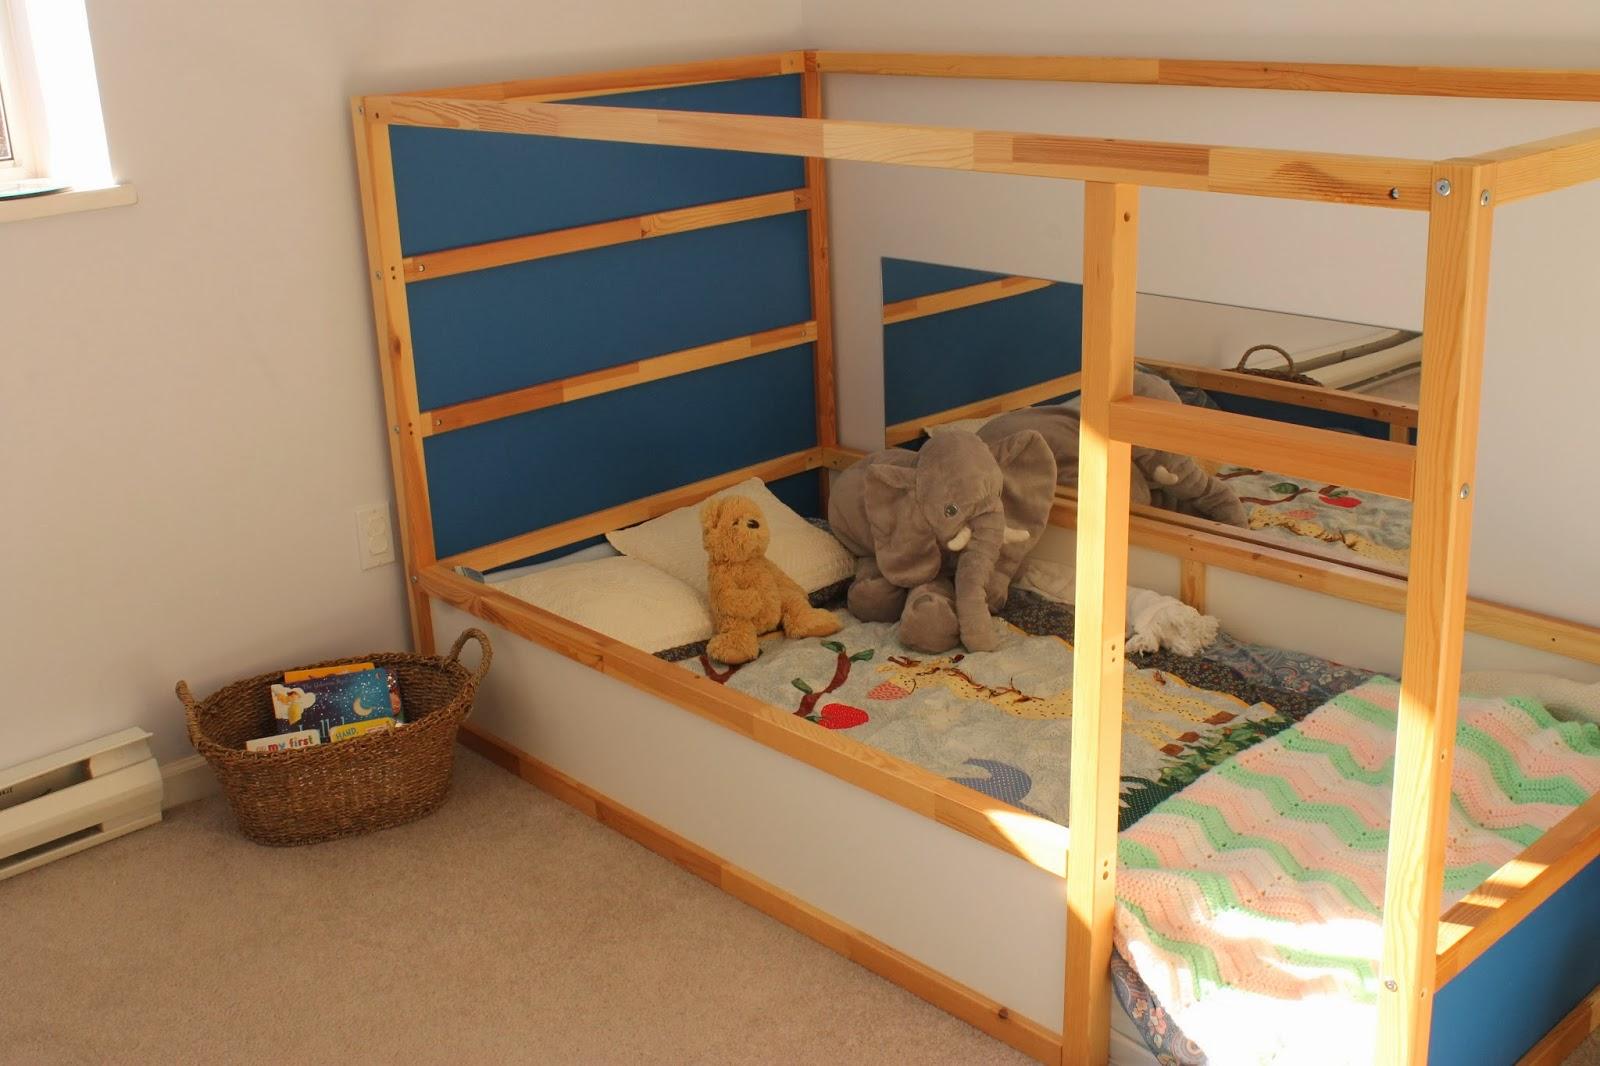 lj 39 s montessori toddler room montessori beginnings bloglovin. Black Bedroom Furniture Sets. Home Design Ideas